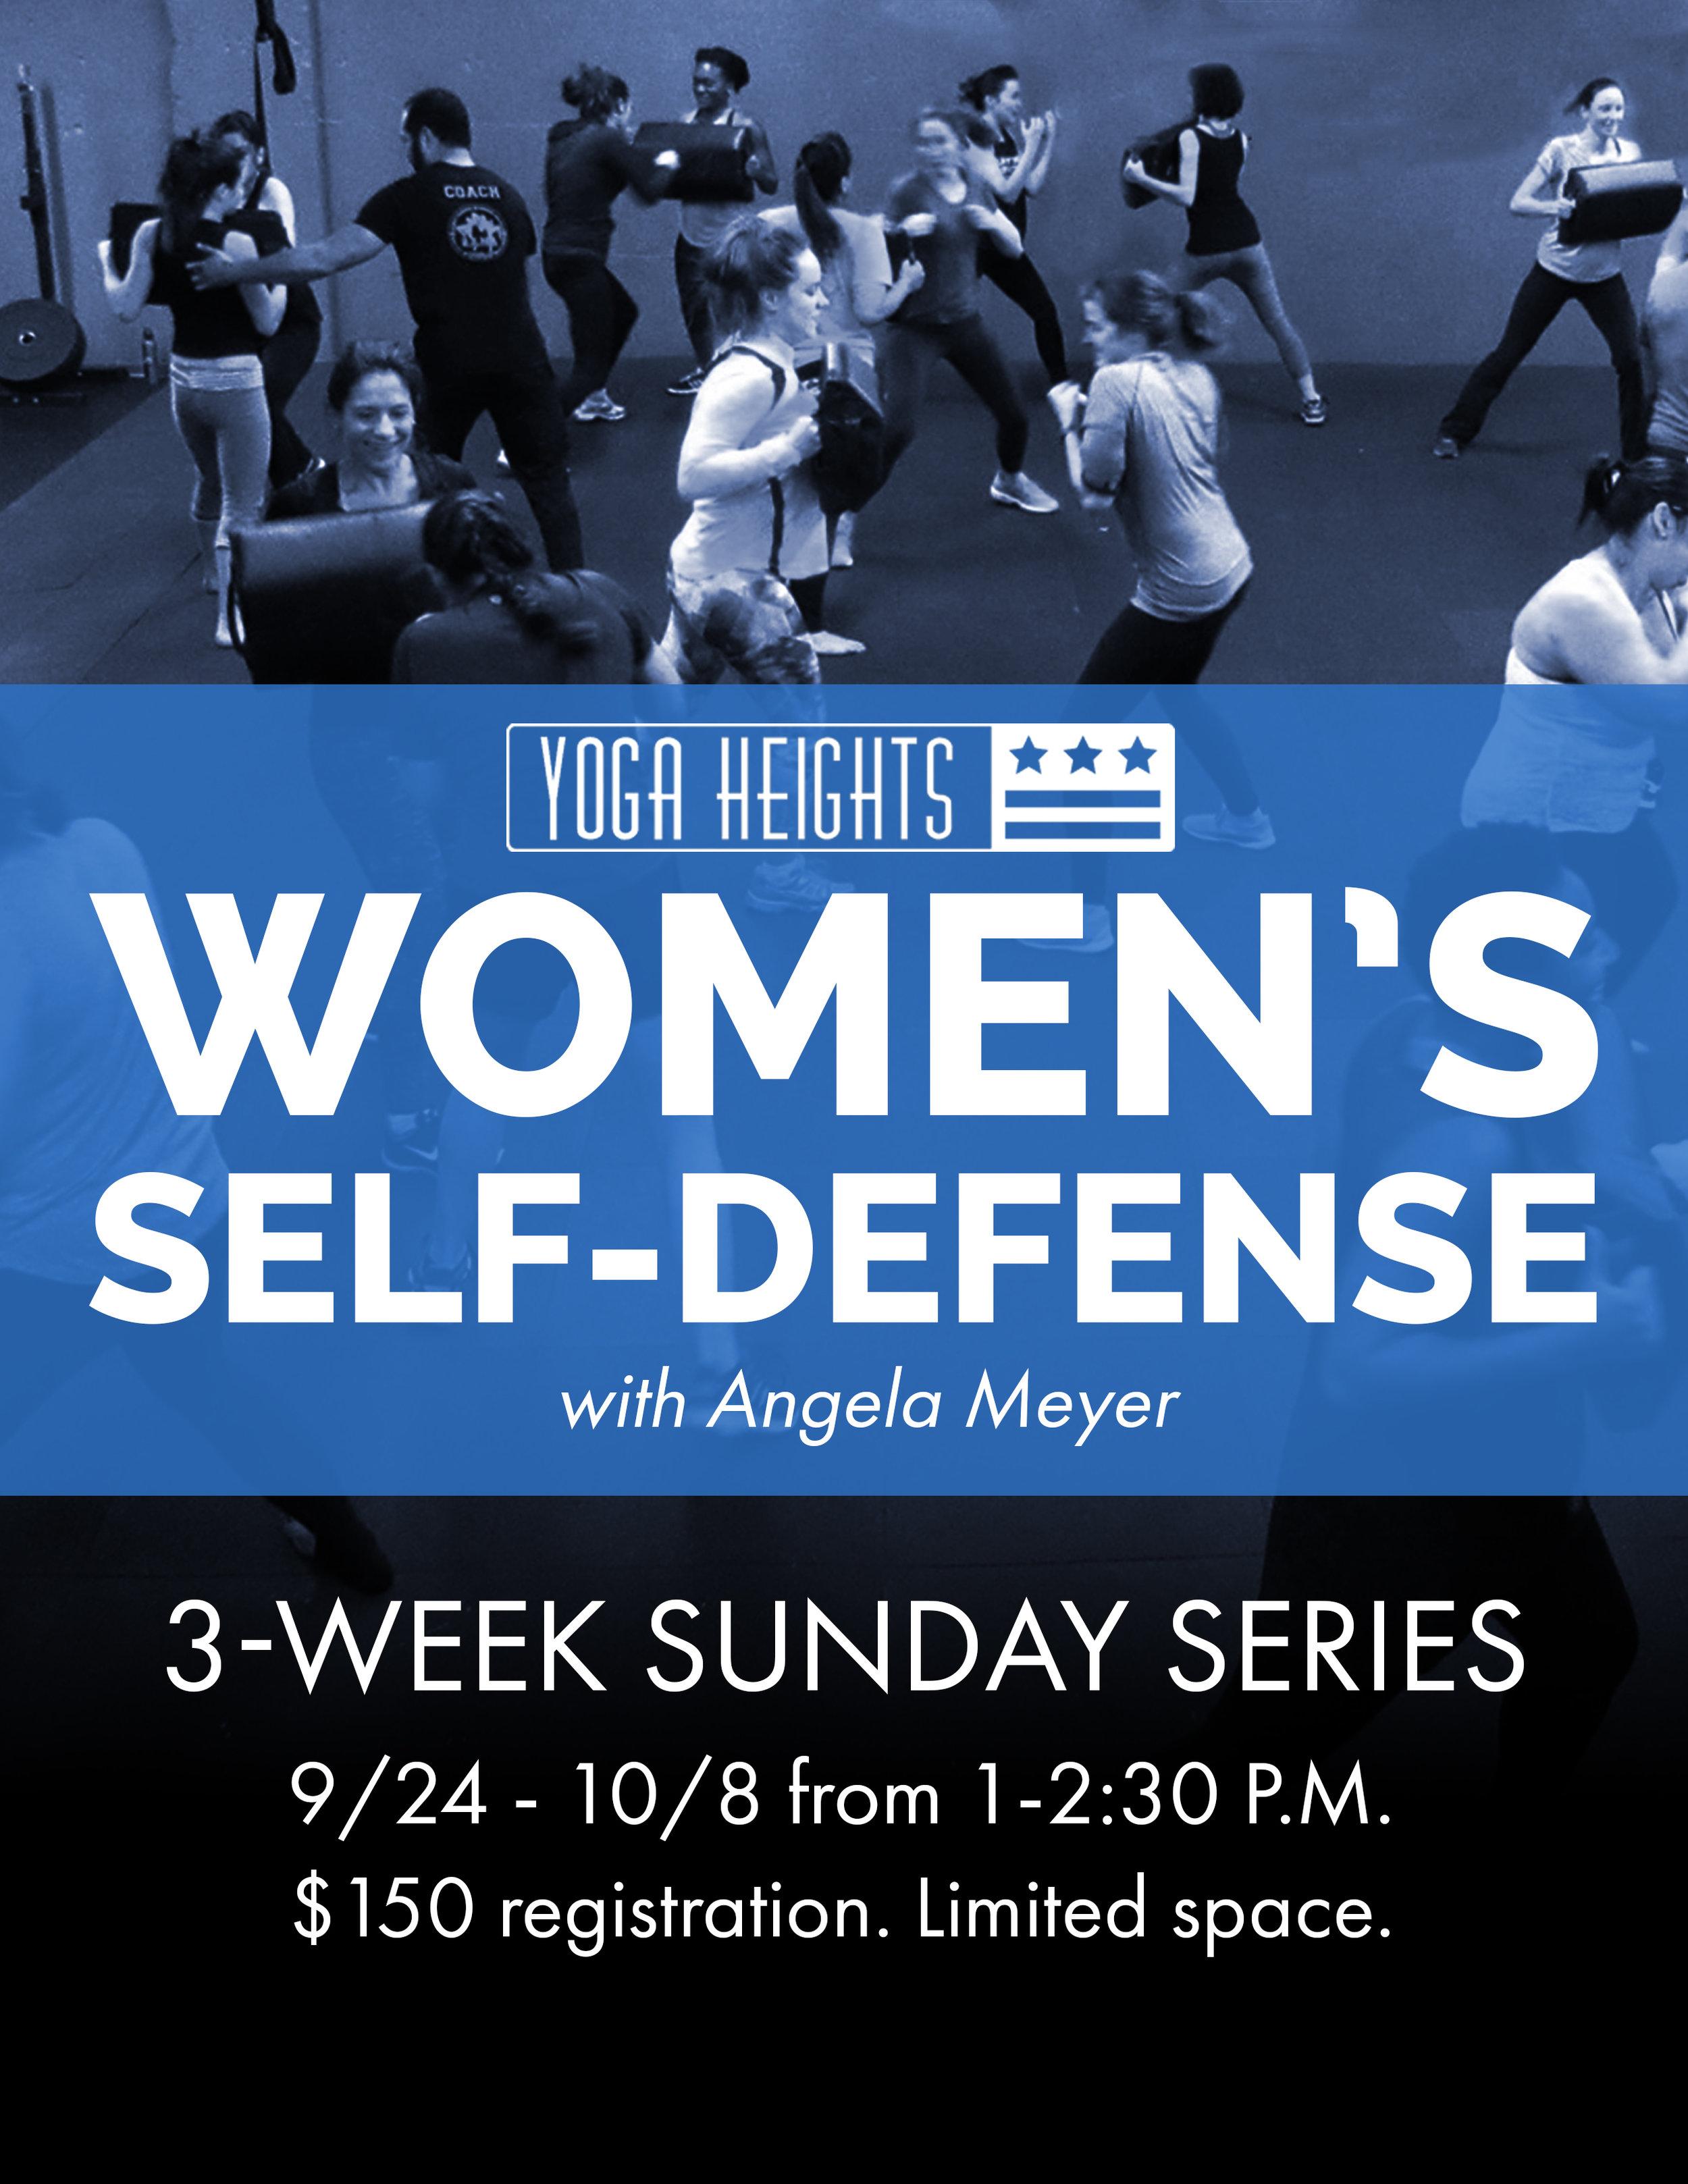 Women's Self Defense Social Poster.jpg